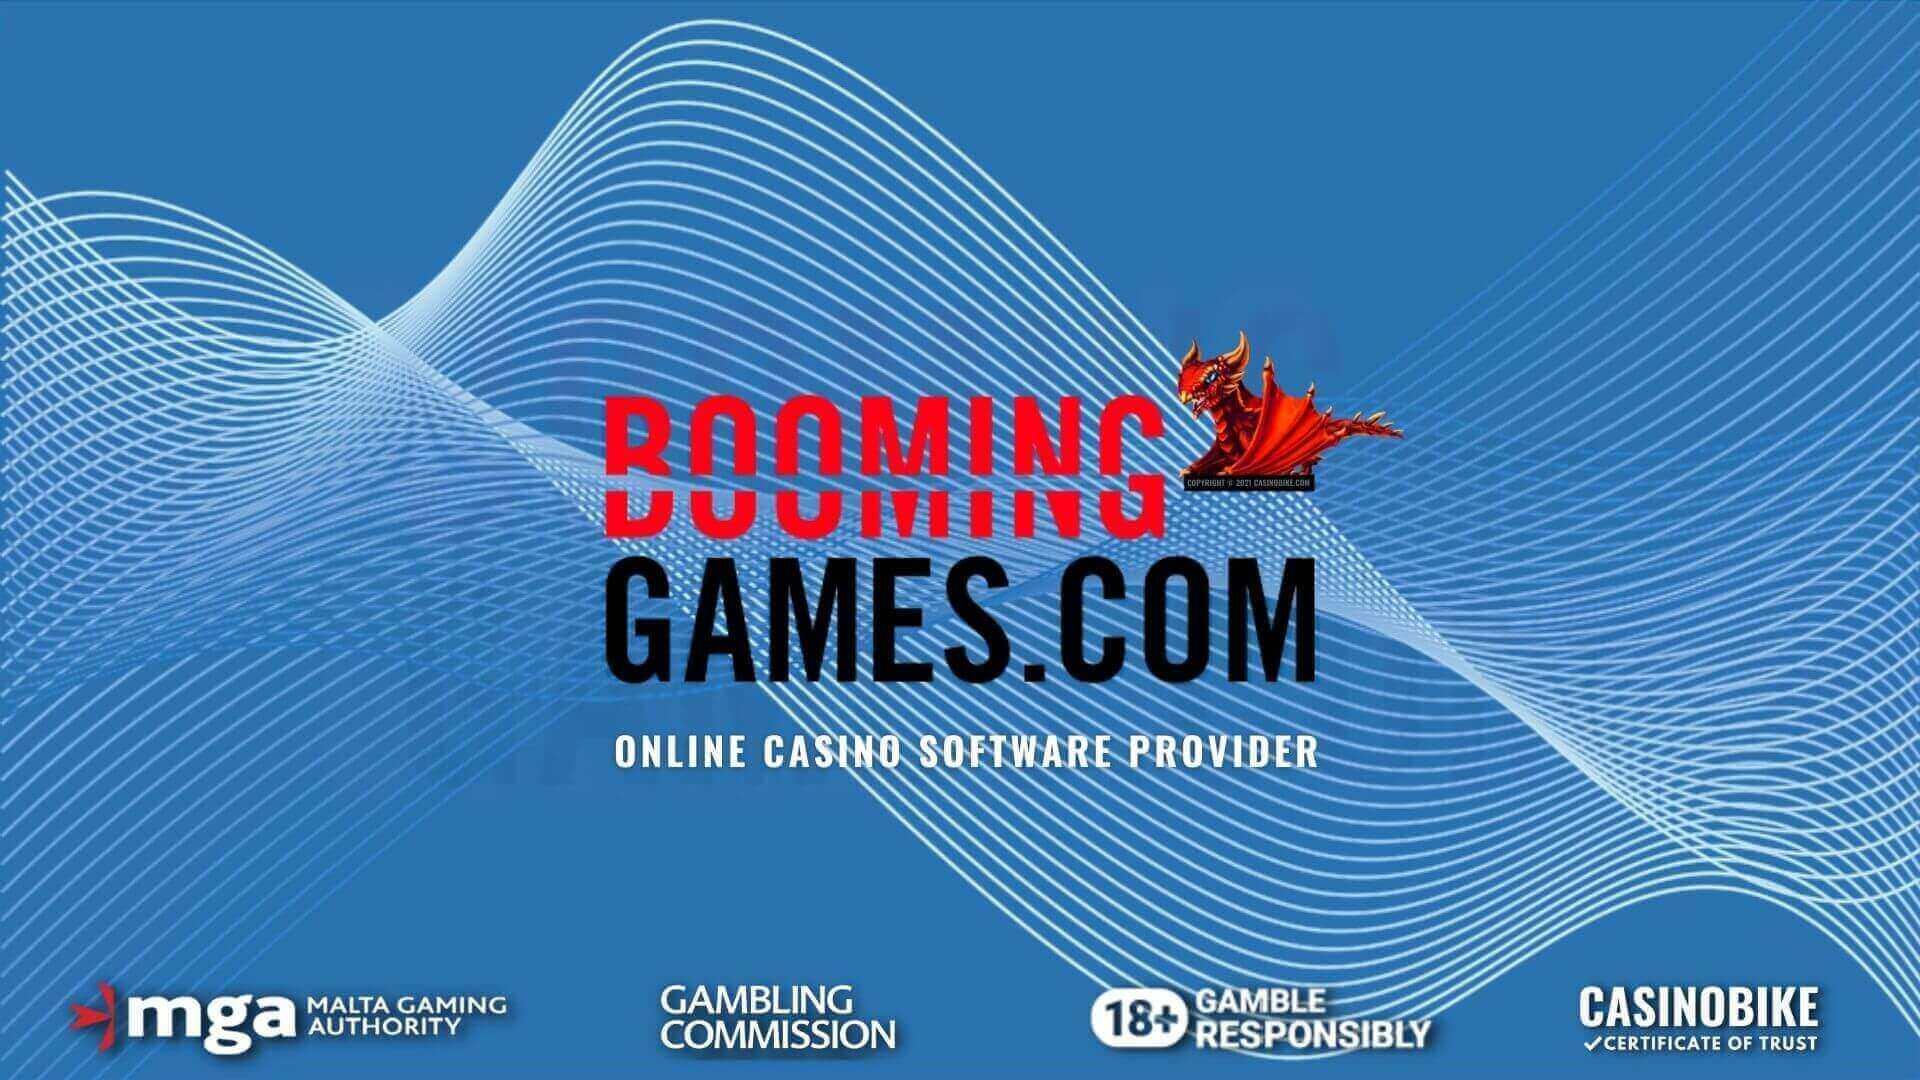 Booming Games Casino Software Provider